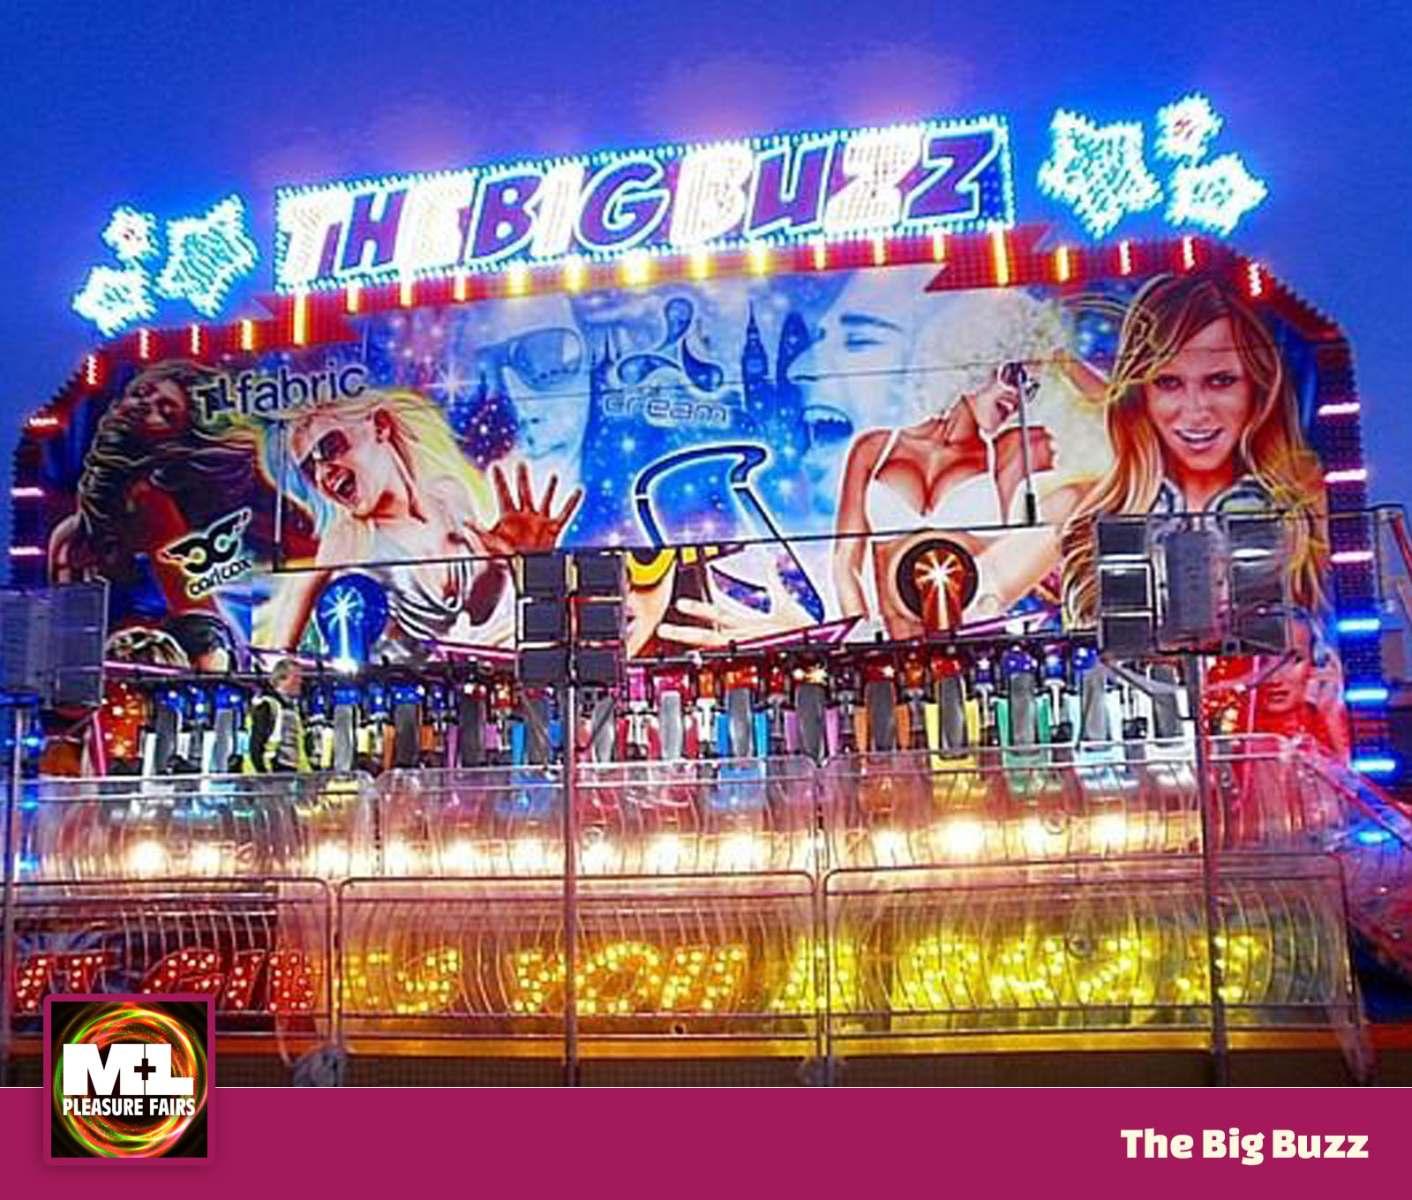 The Big Buzz Ride Image